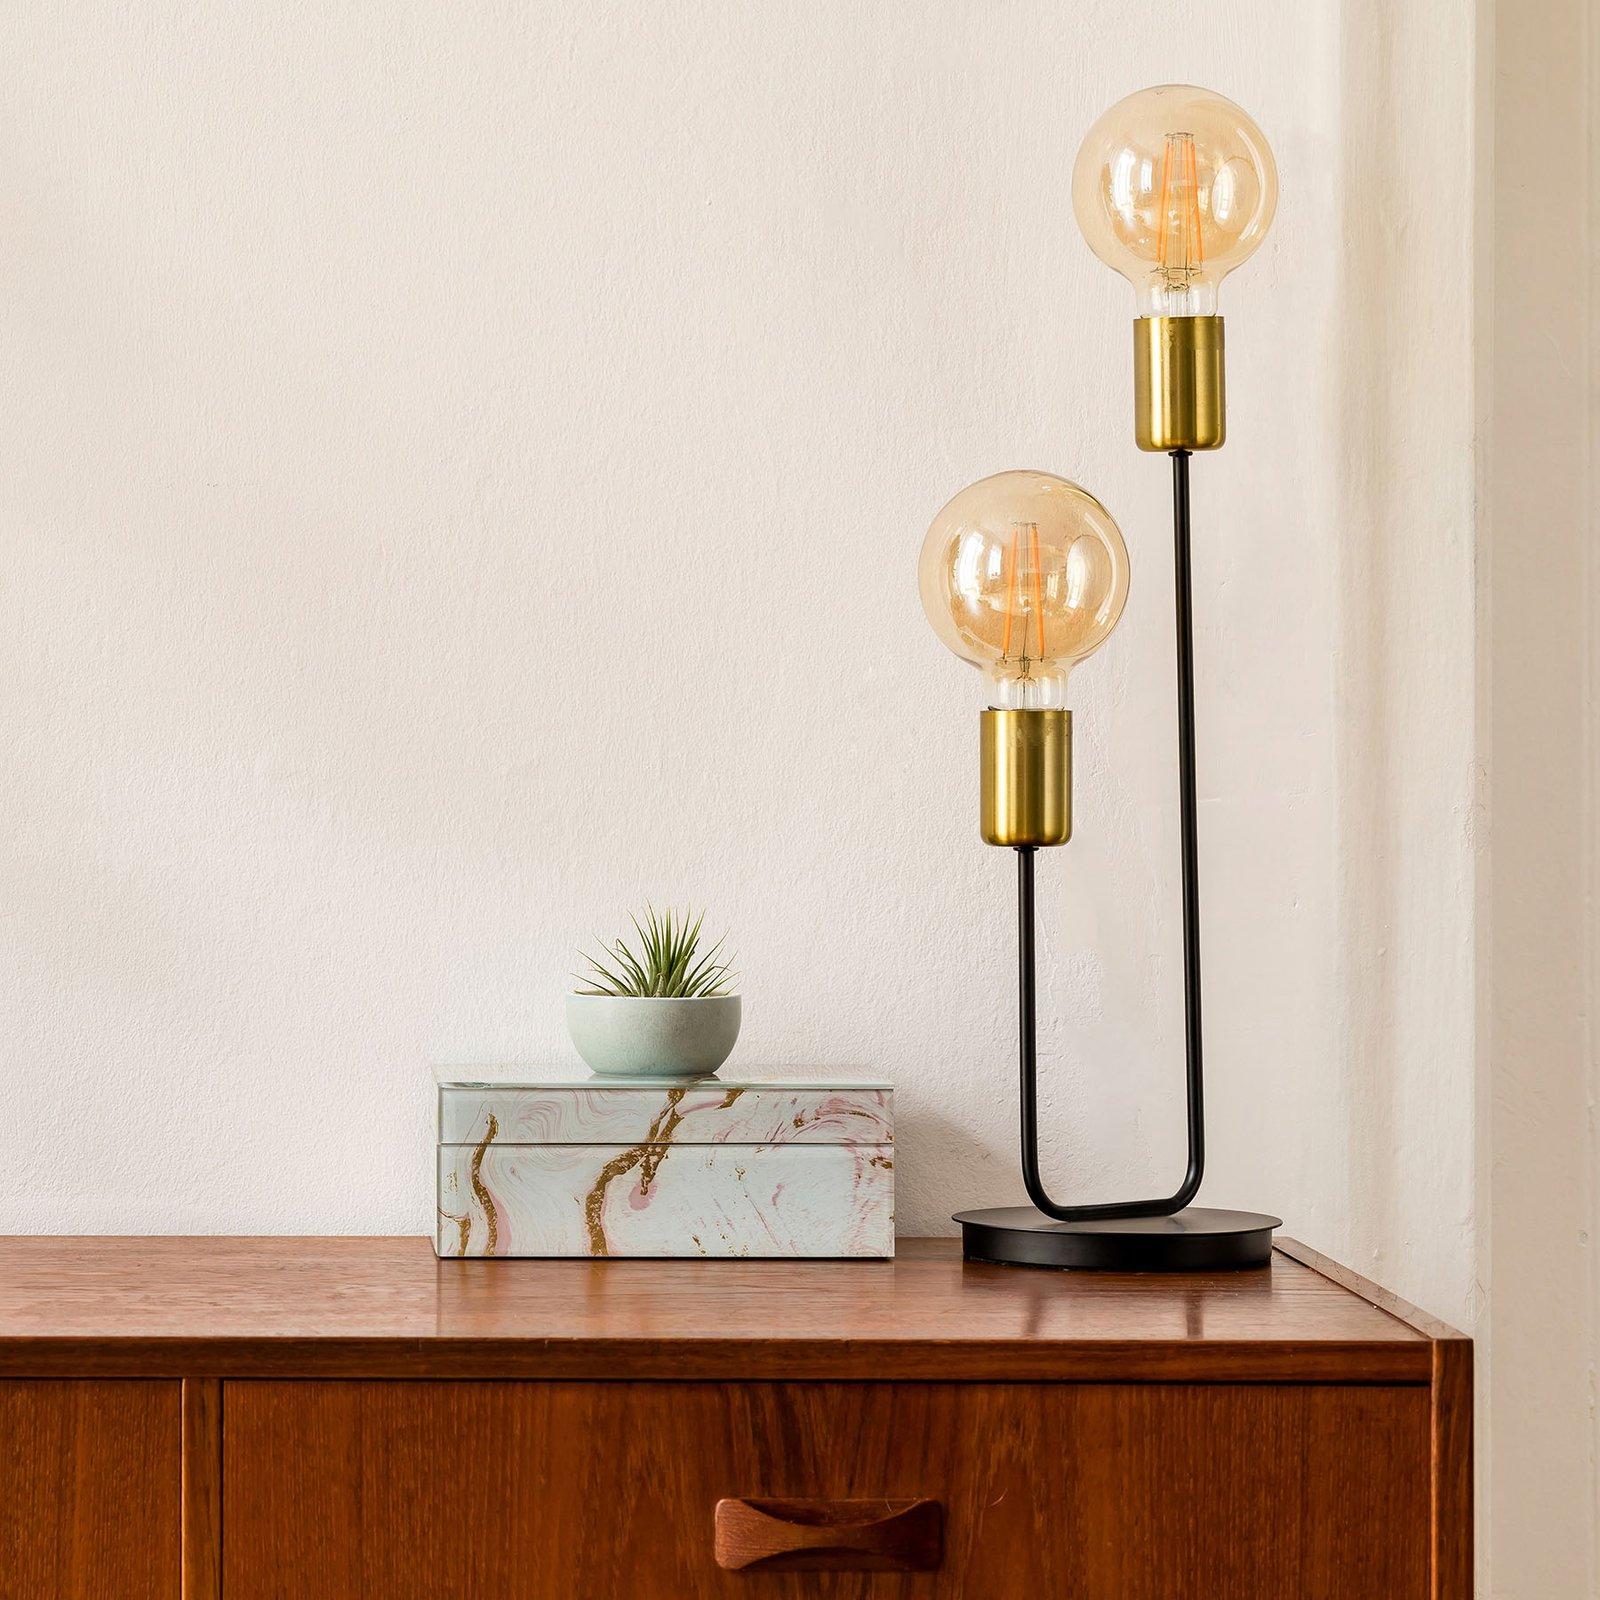 Modo bordlampe, 2 lyskilder, svart